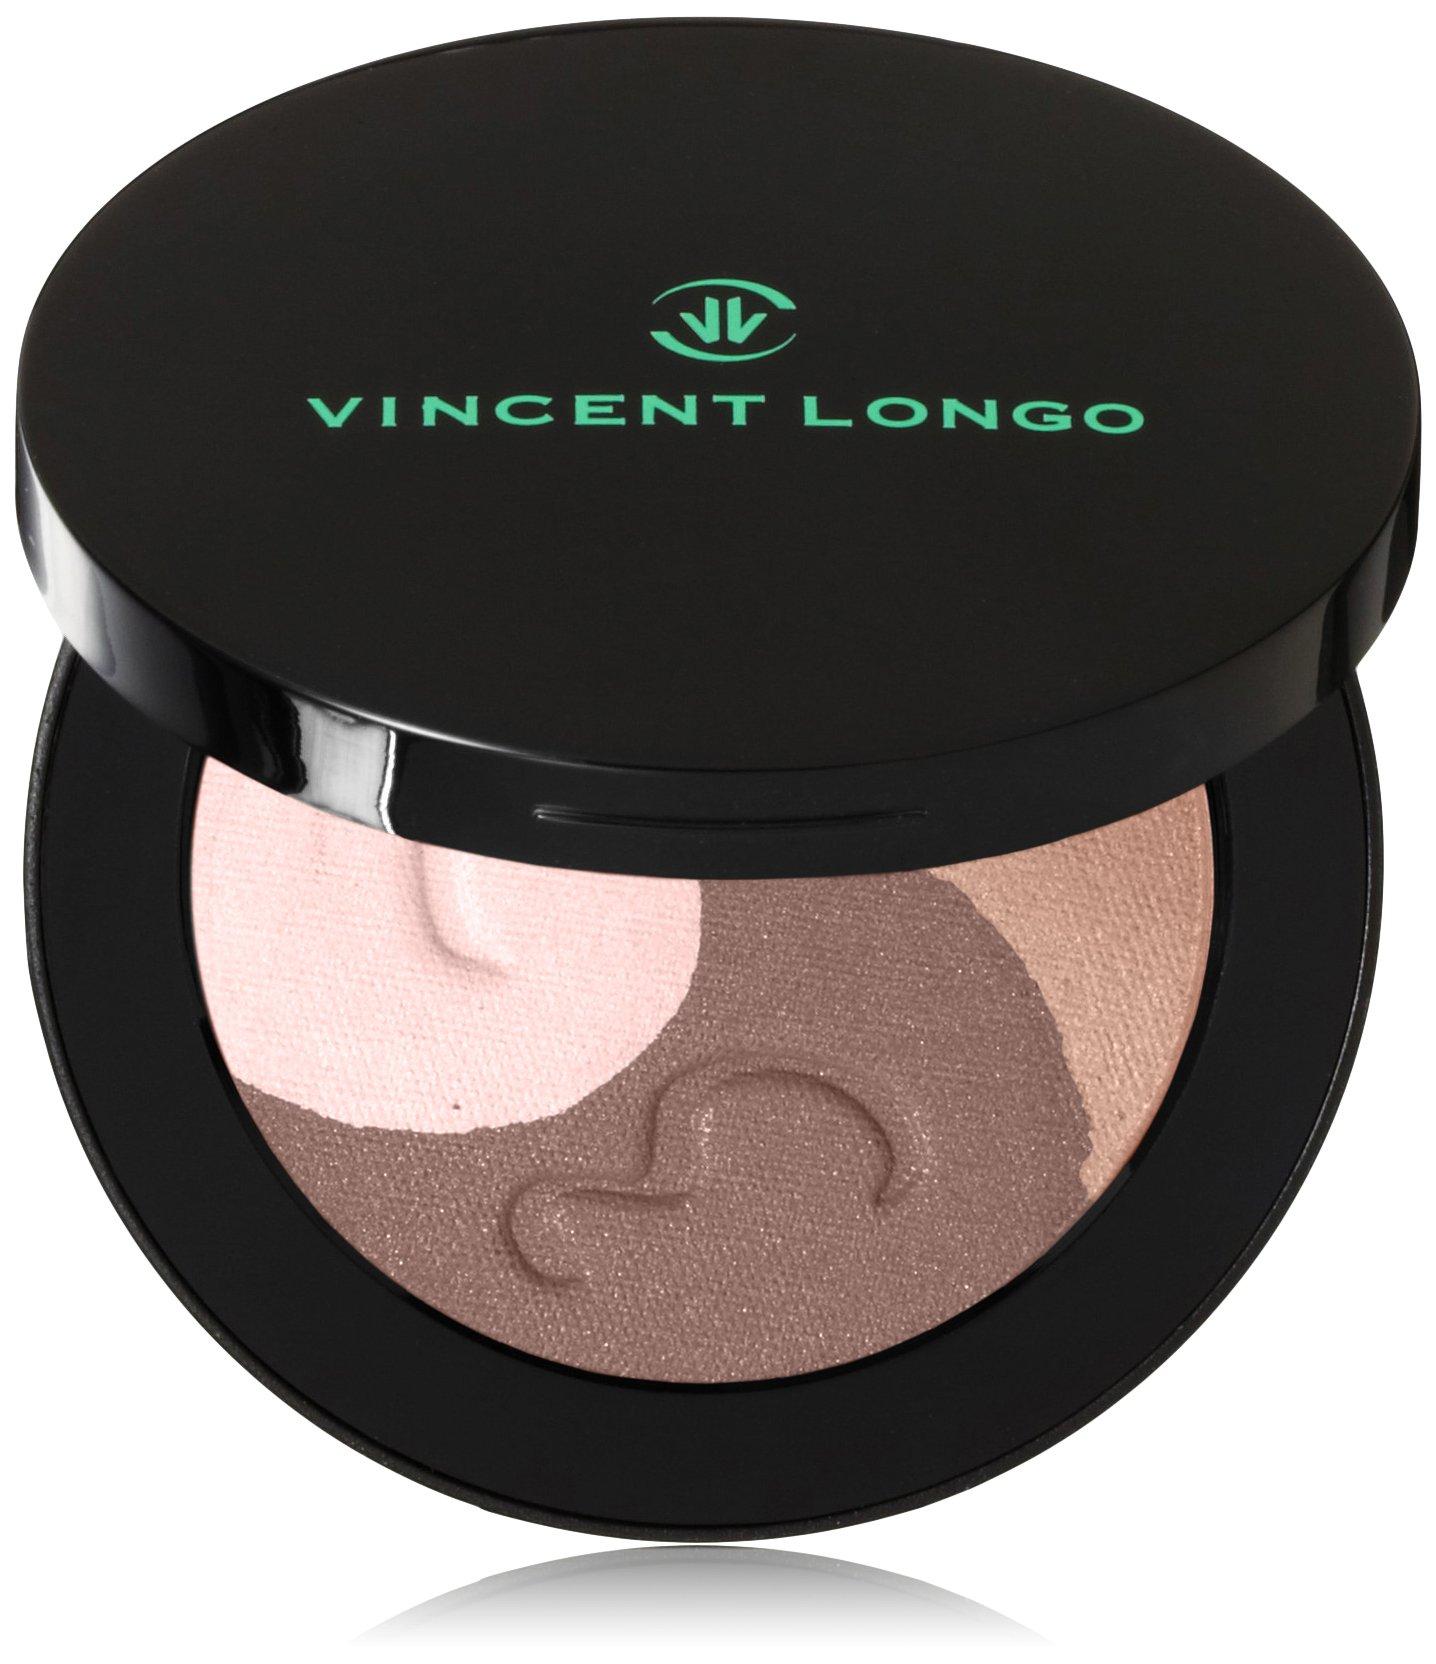 Sheer Pigment Lipstick by vincent longo #10